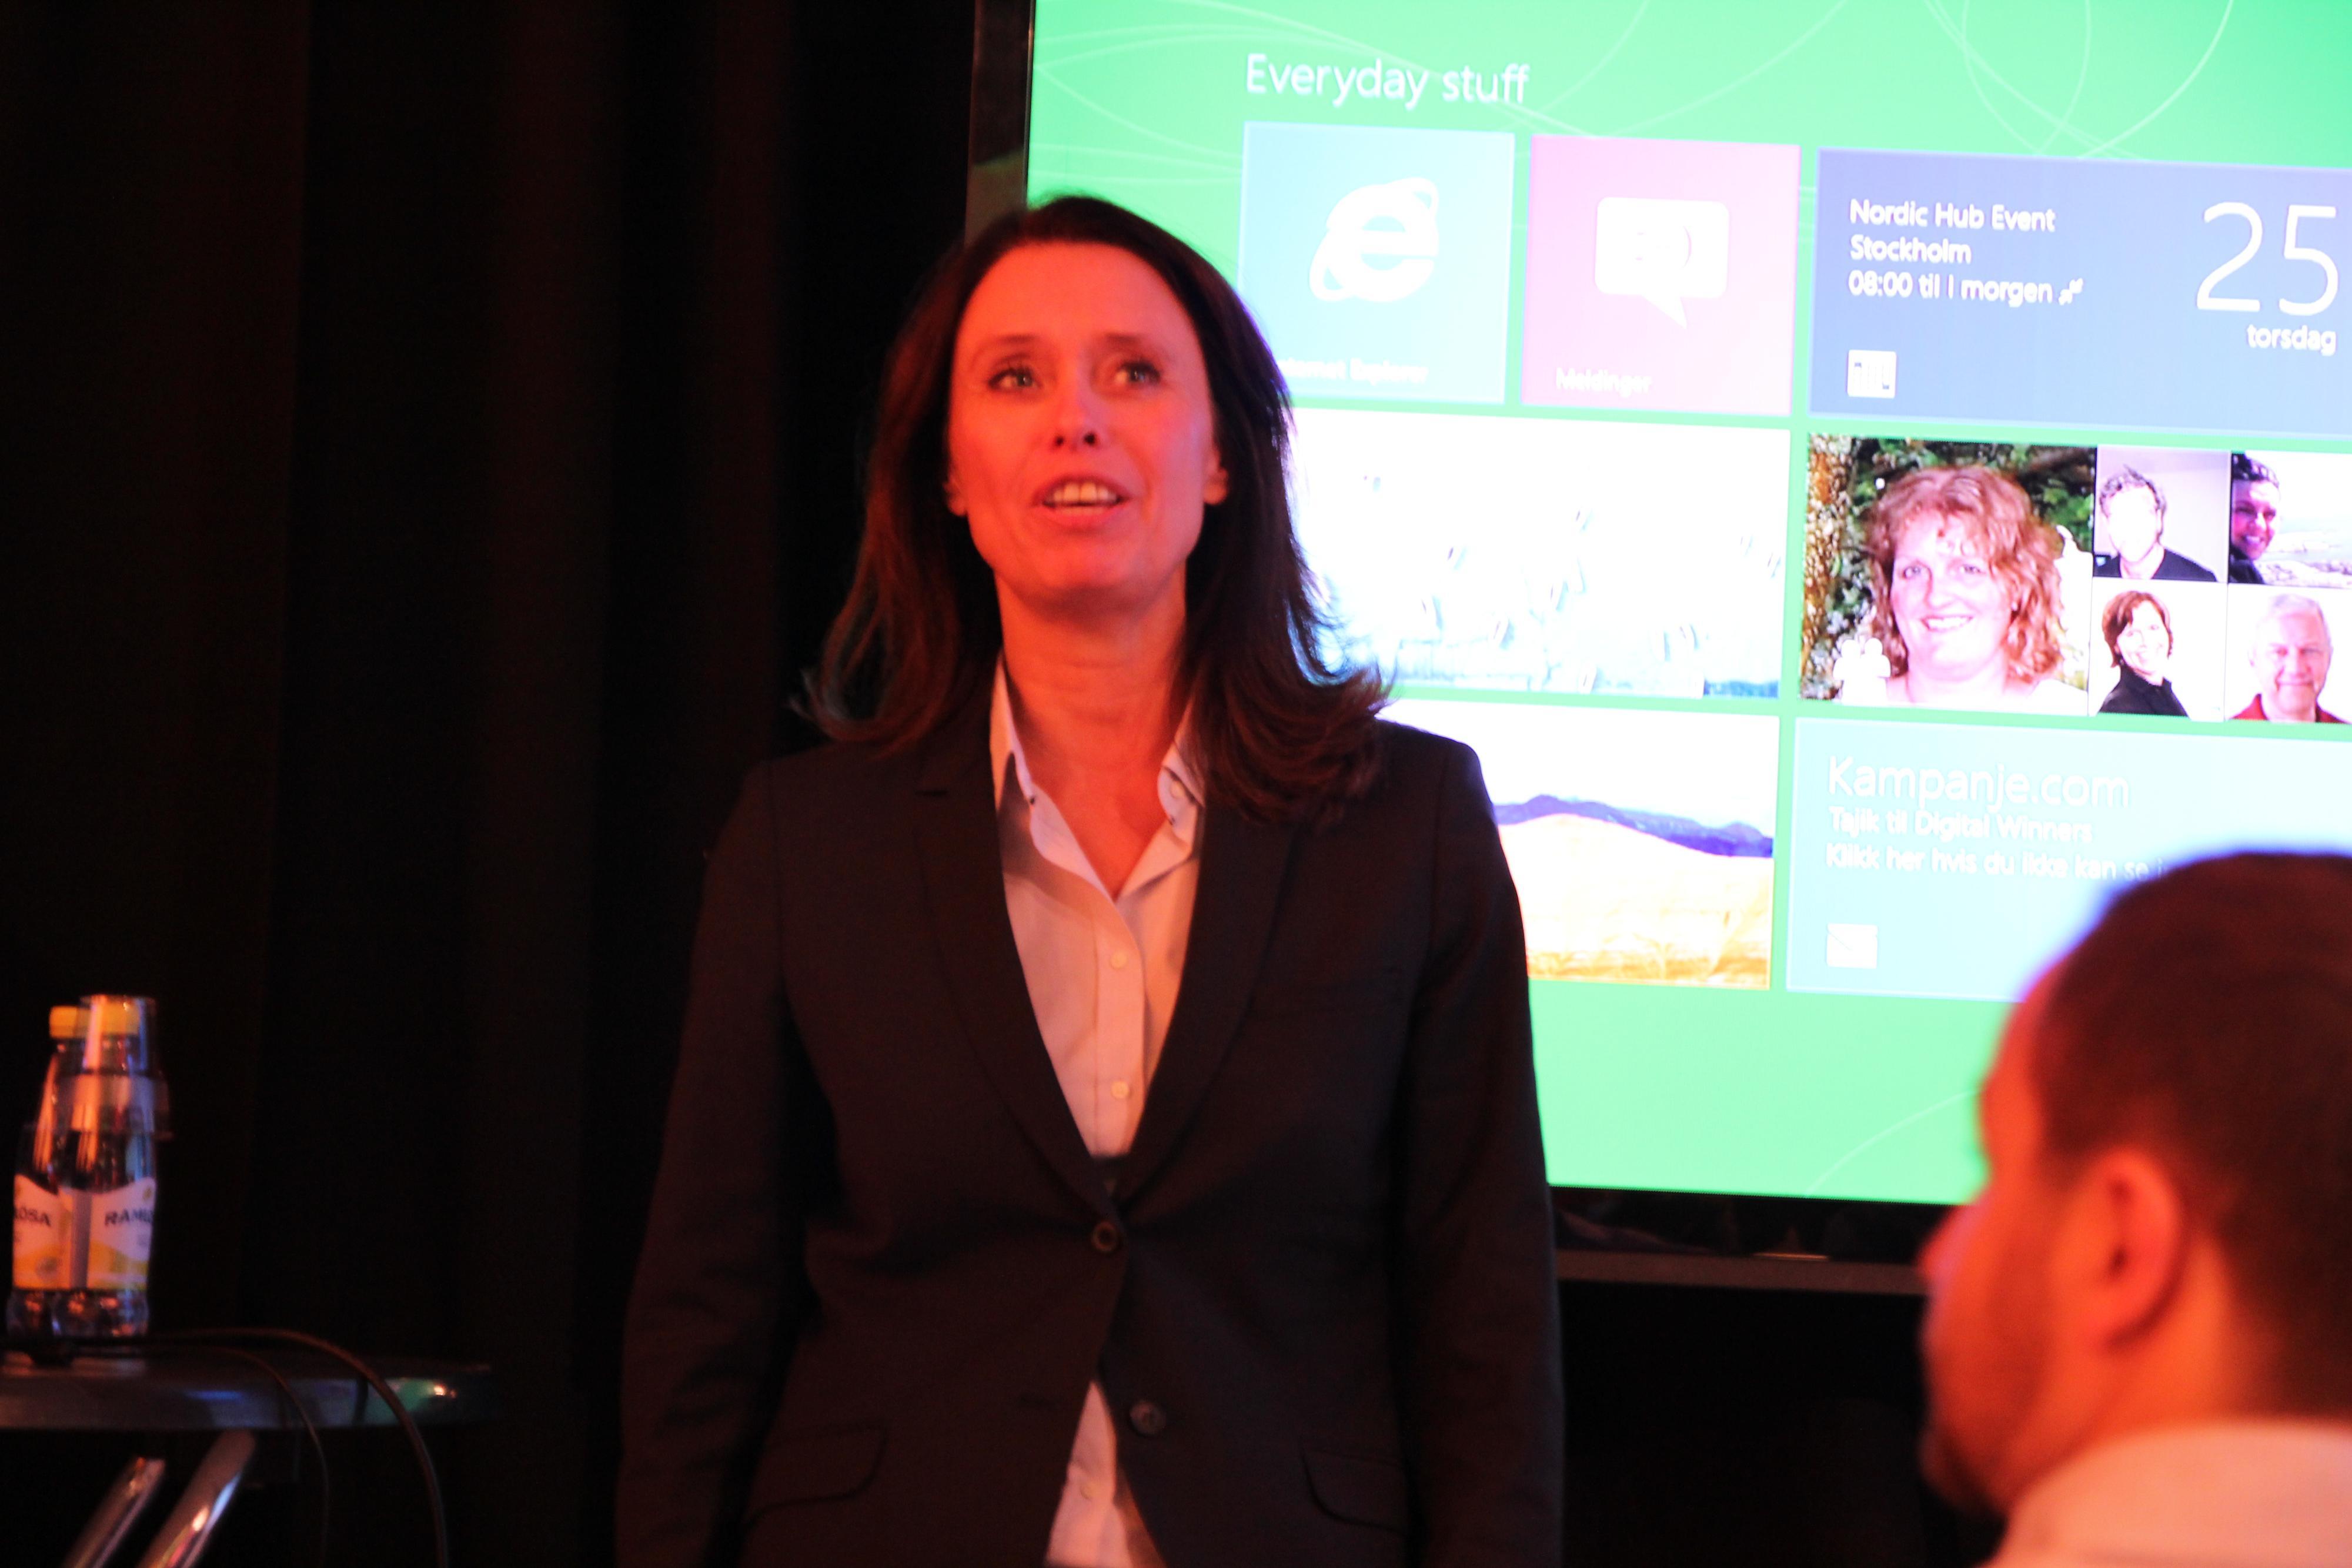 Administrerende direktør i Microsoft Norge, Hege Skryseth.Foto: Niklas Plikk, Hardware.no